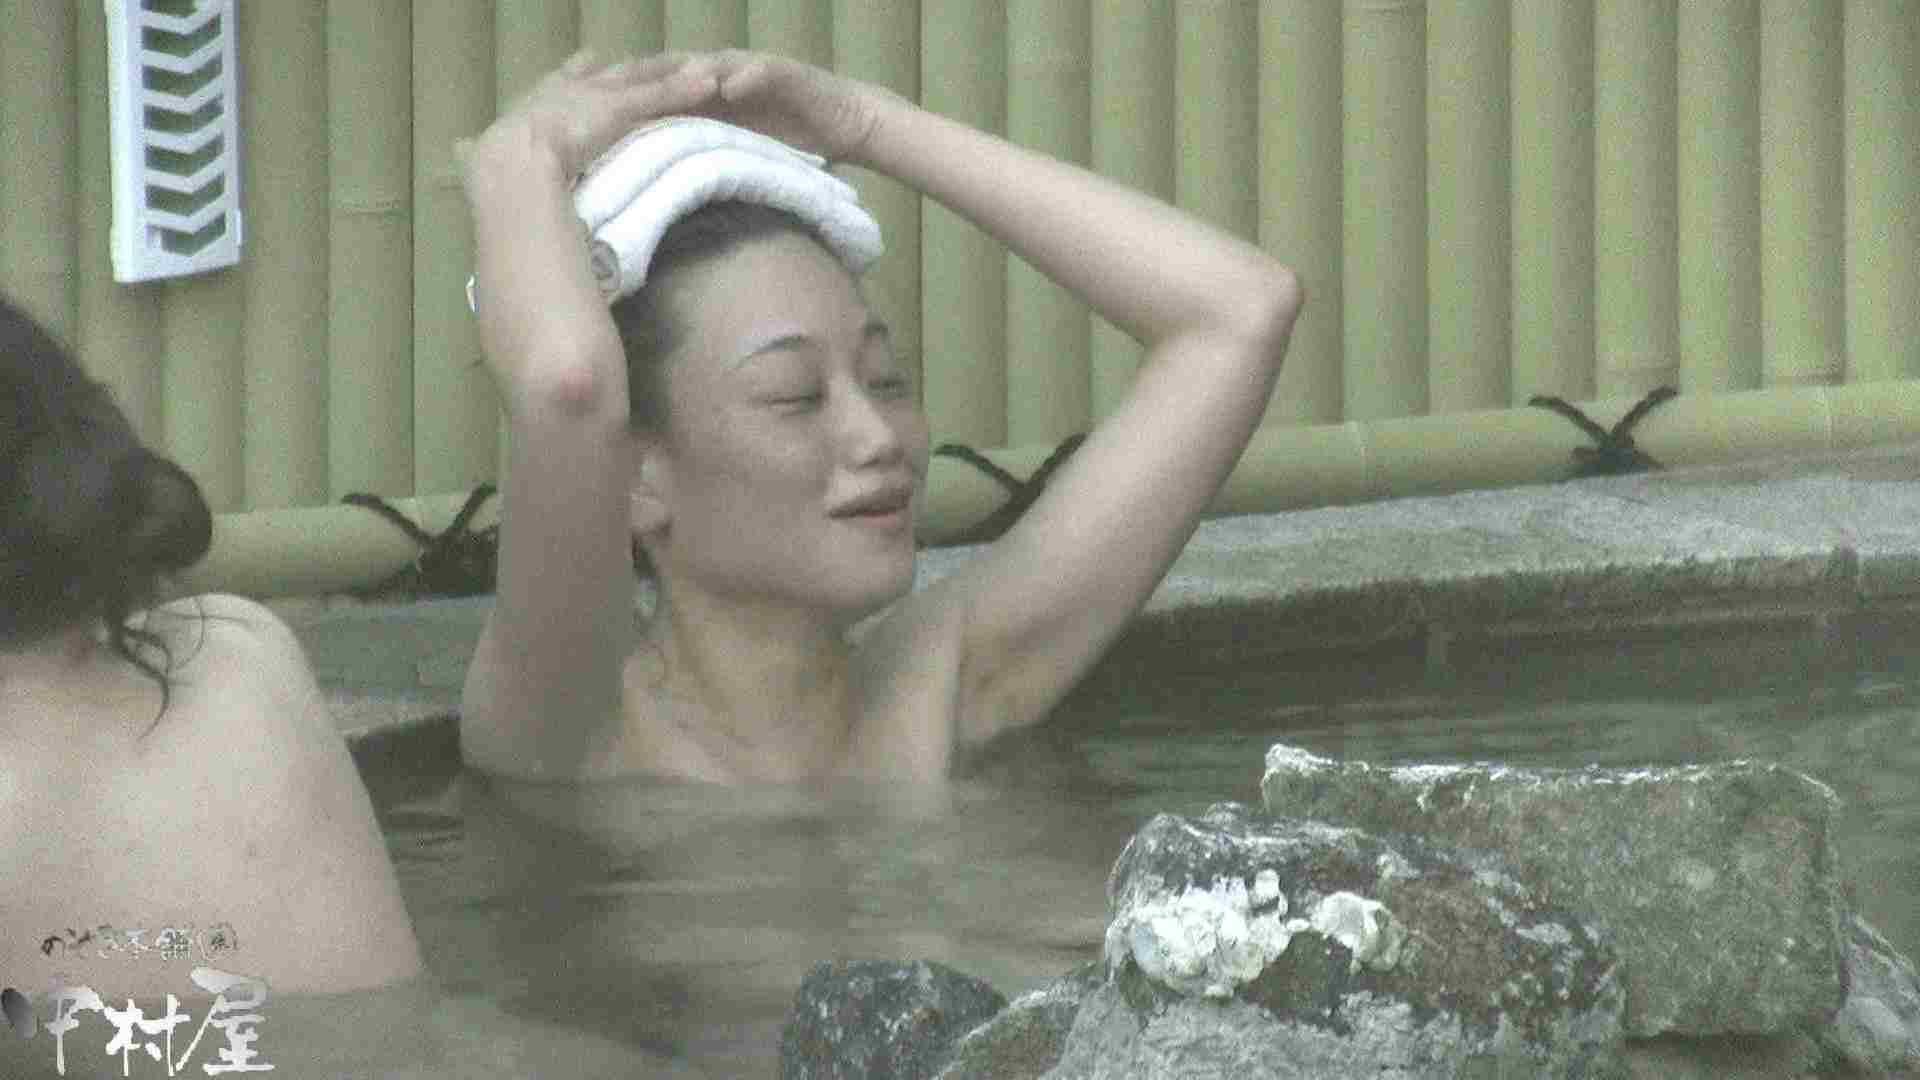 Aquaな露天風呂Vol.914 露天風呂編  83PIX 76